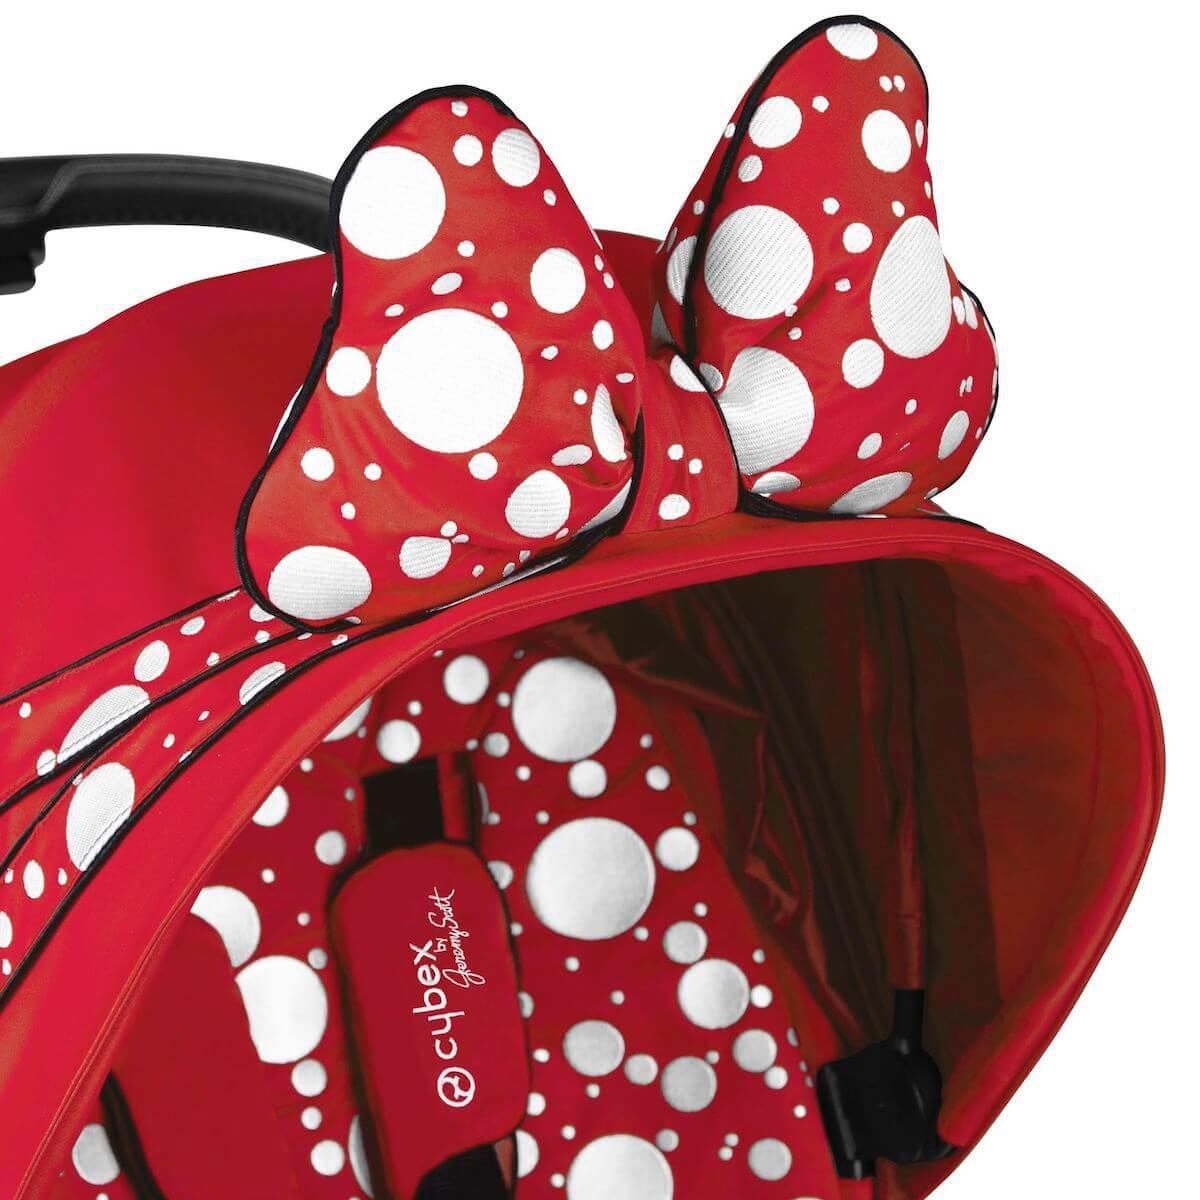 Poussette PRIAM Cybex Petticoat Red dark red-noir